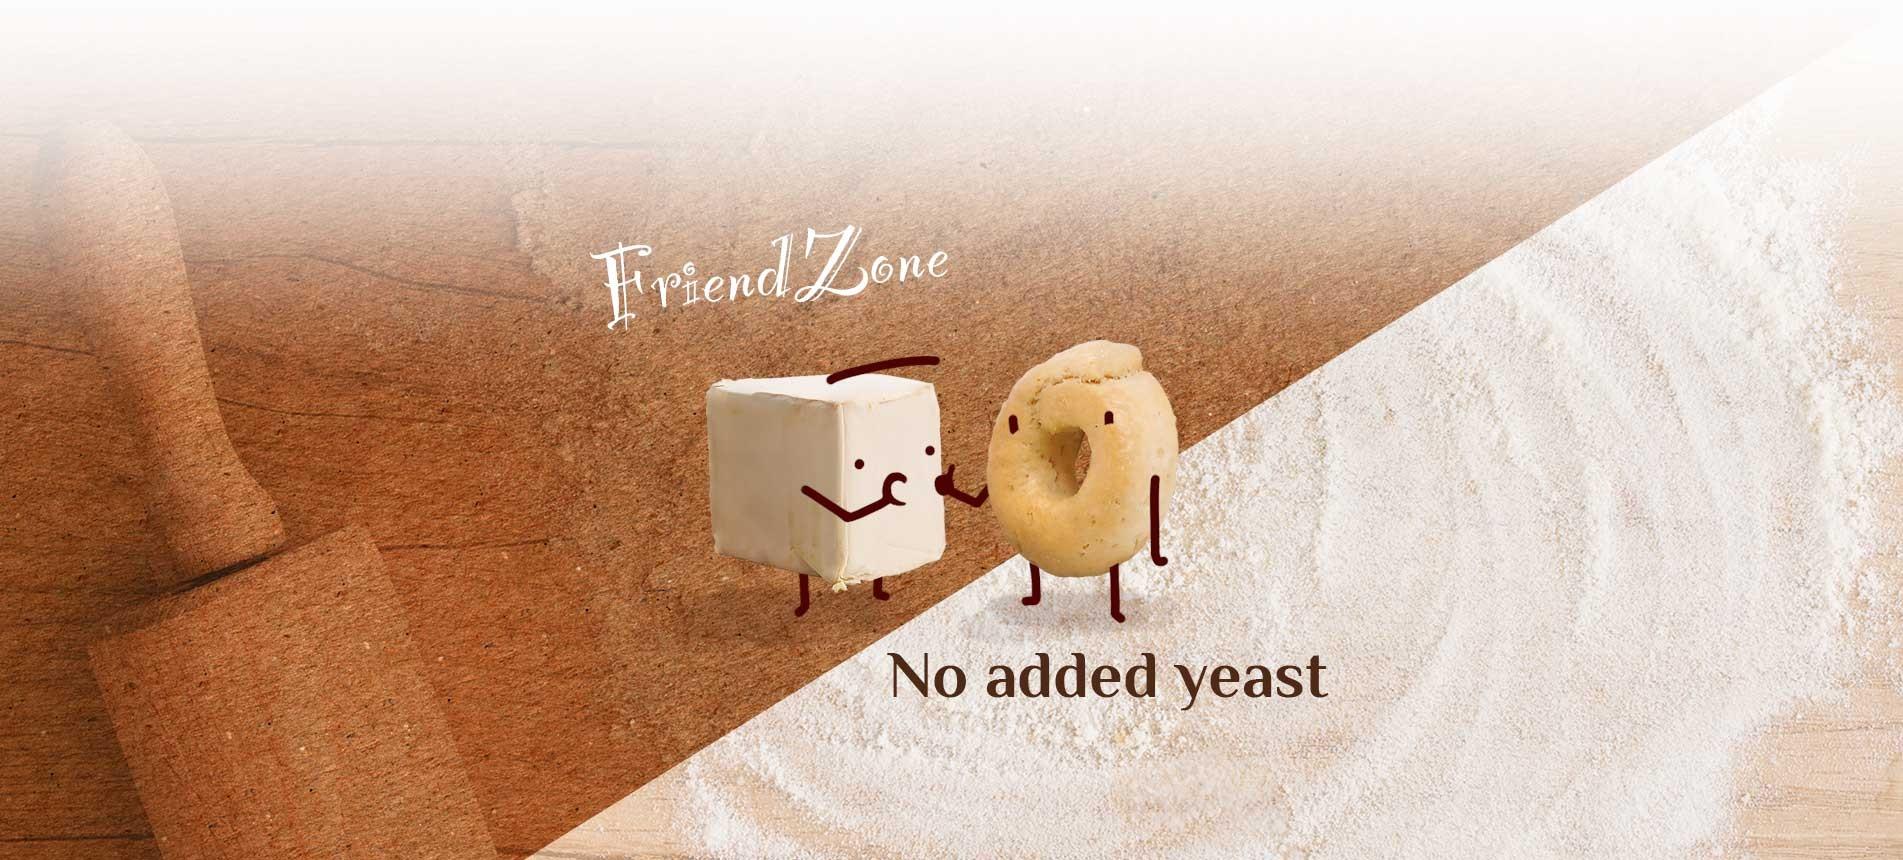 FriendZone no added yeast